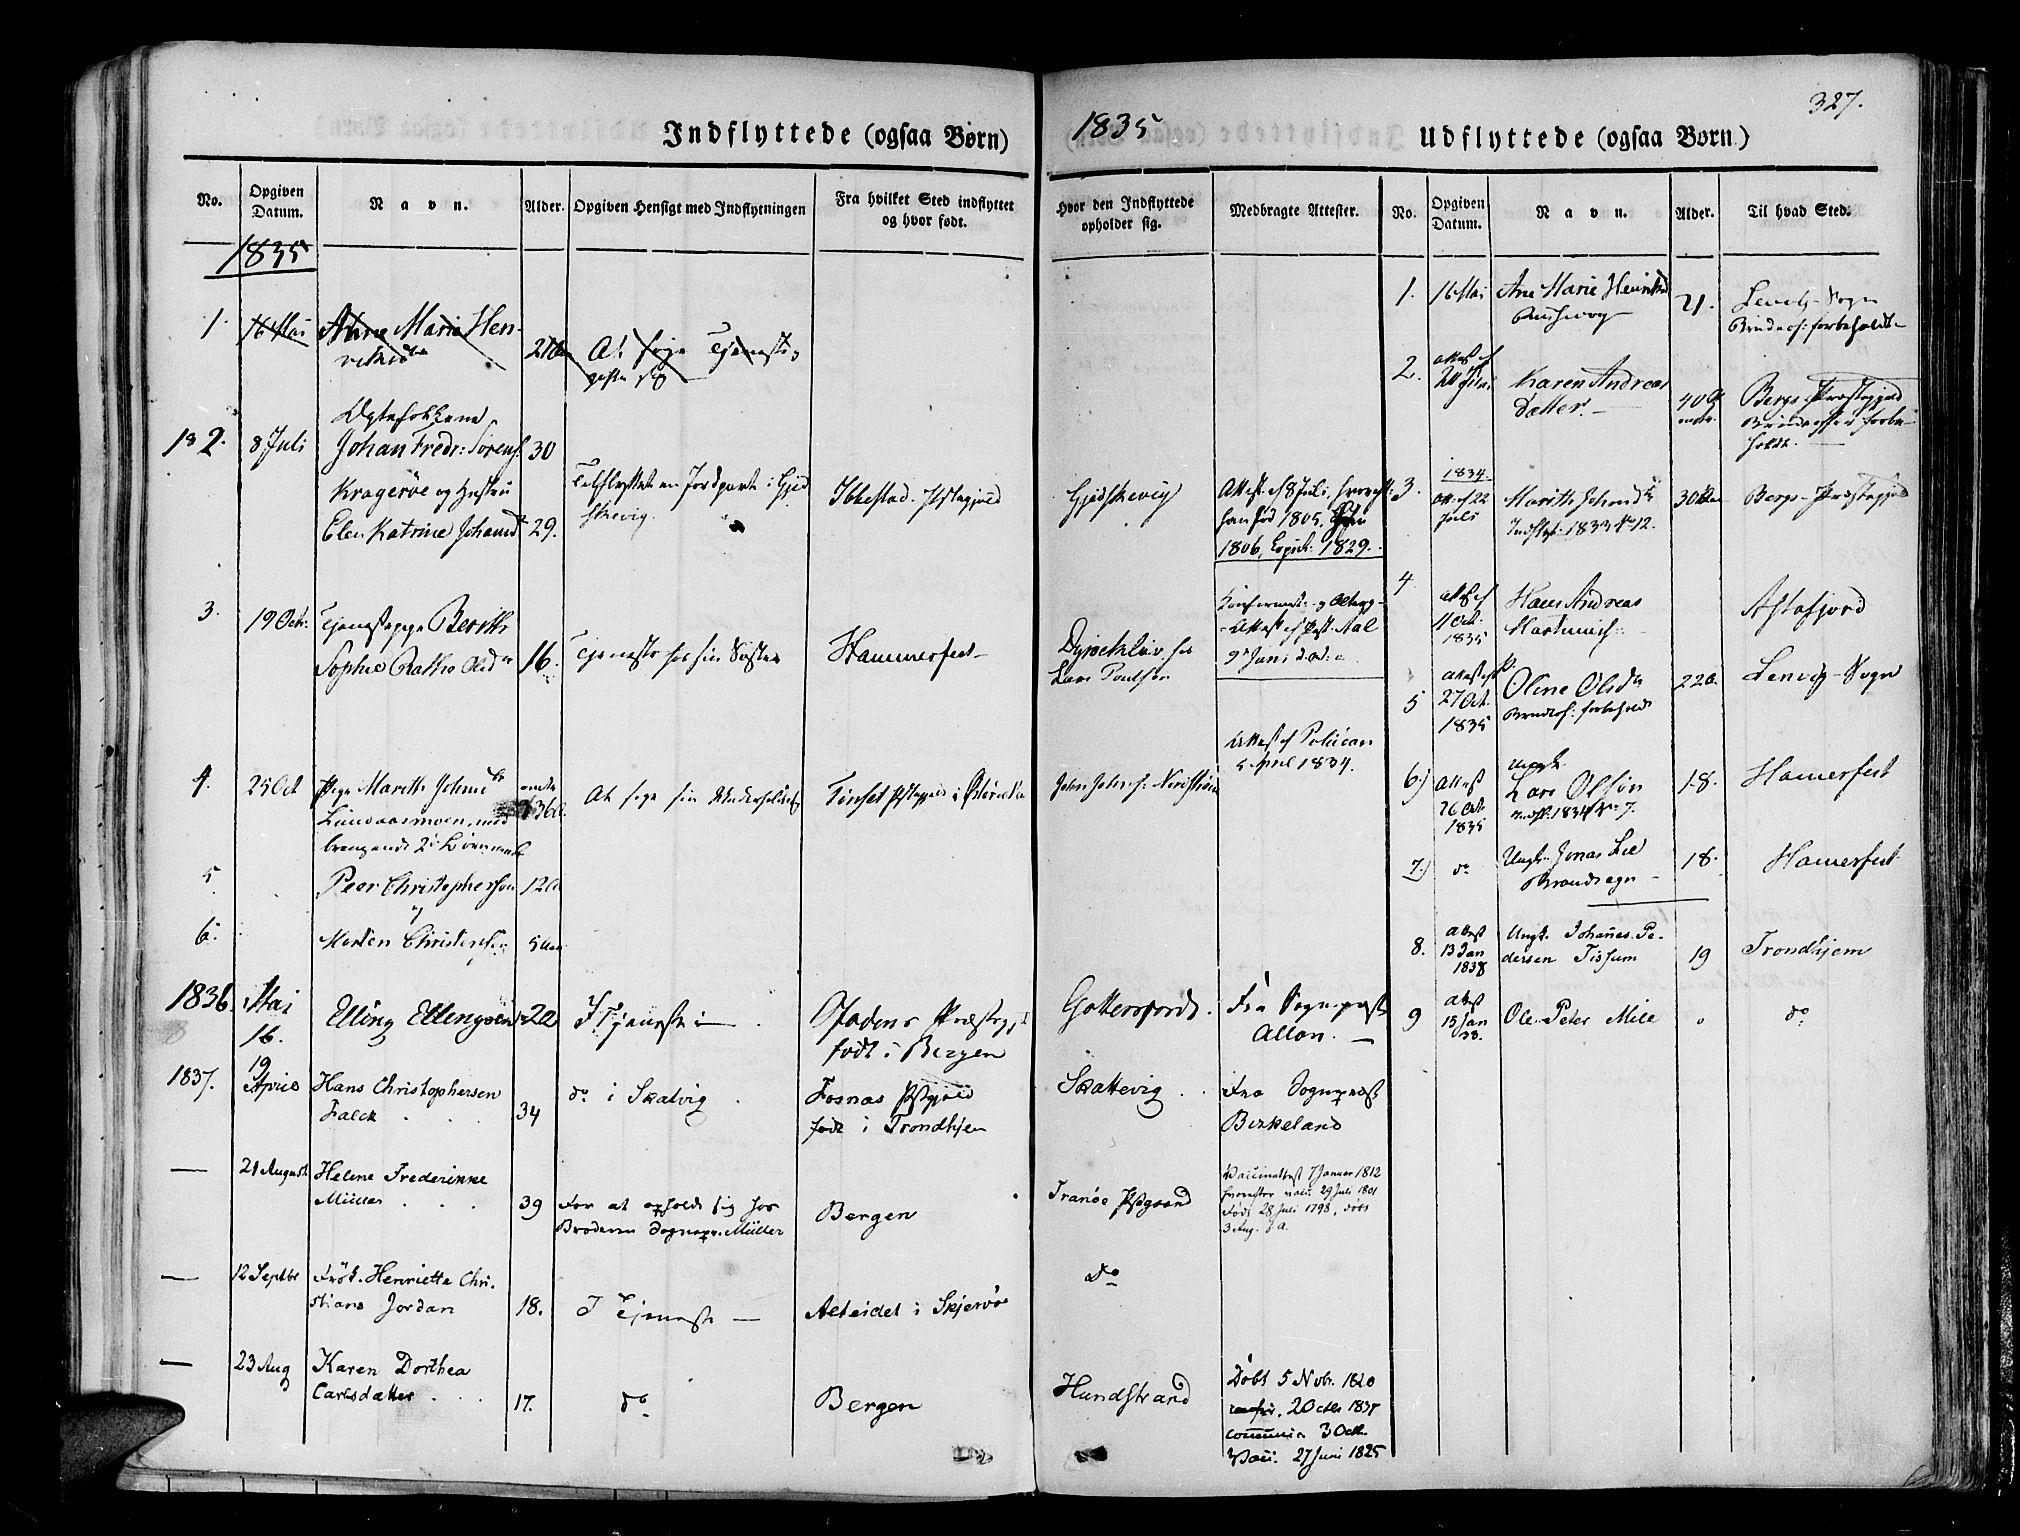 SATØ, Tranøy sokneprestkontor, I/Ia/Iaa/L0005kirke: Ministerialbok nr. 5, 1829-1844, s. 327